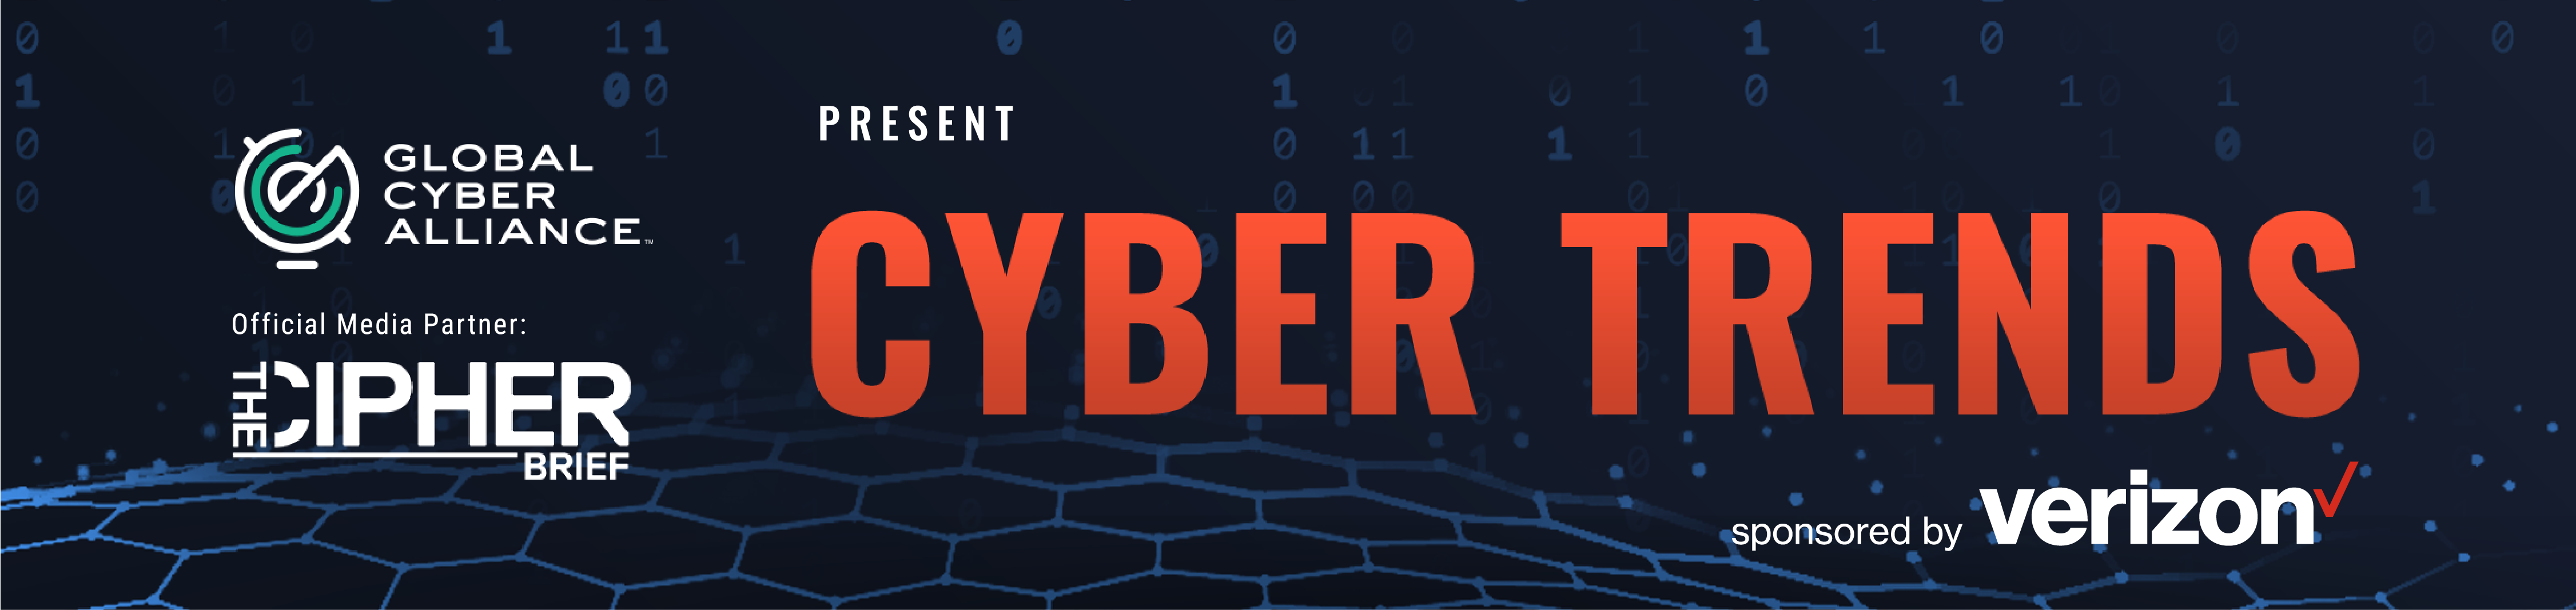 Cyber Trends Graphics 2021-Verizon-Cipher_2021_Web headline